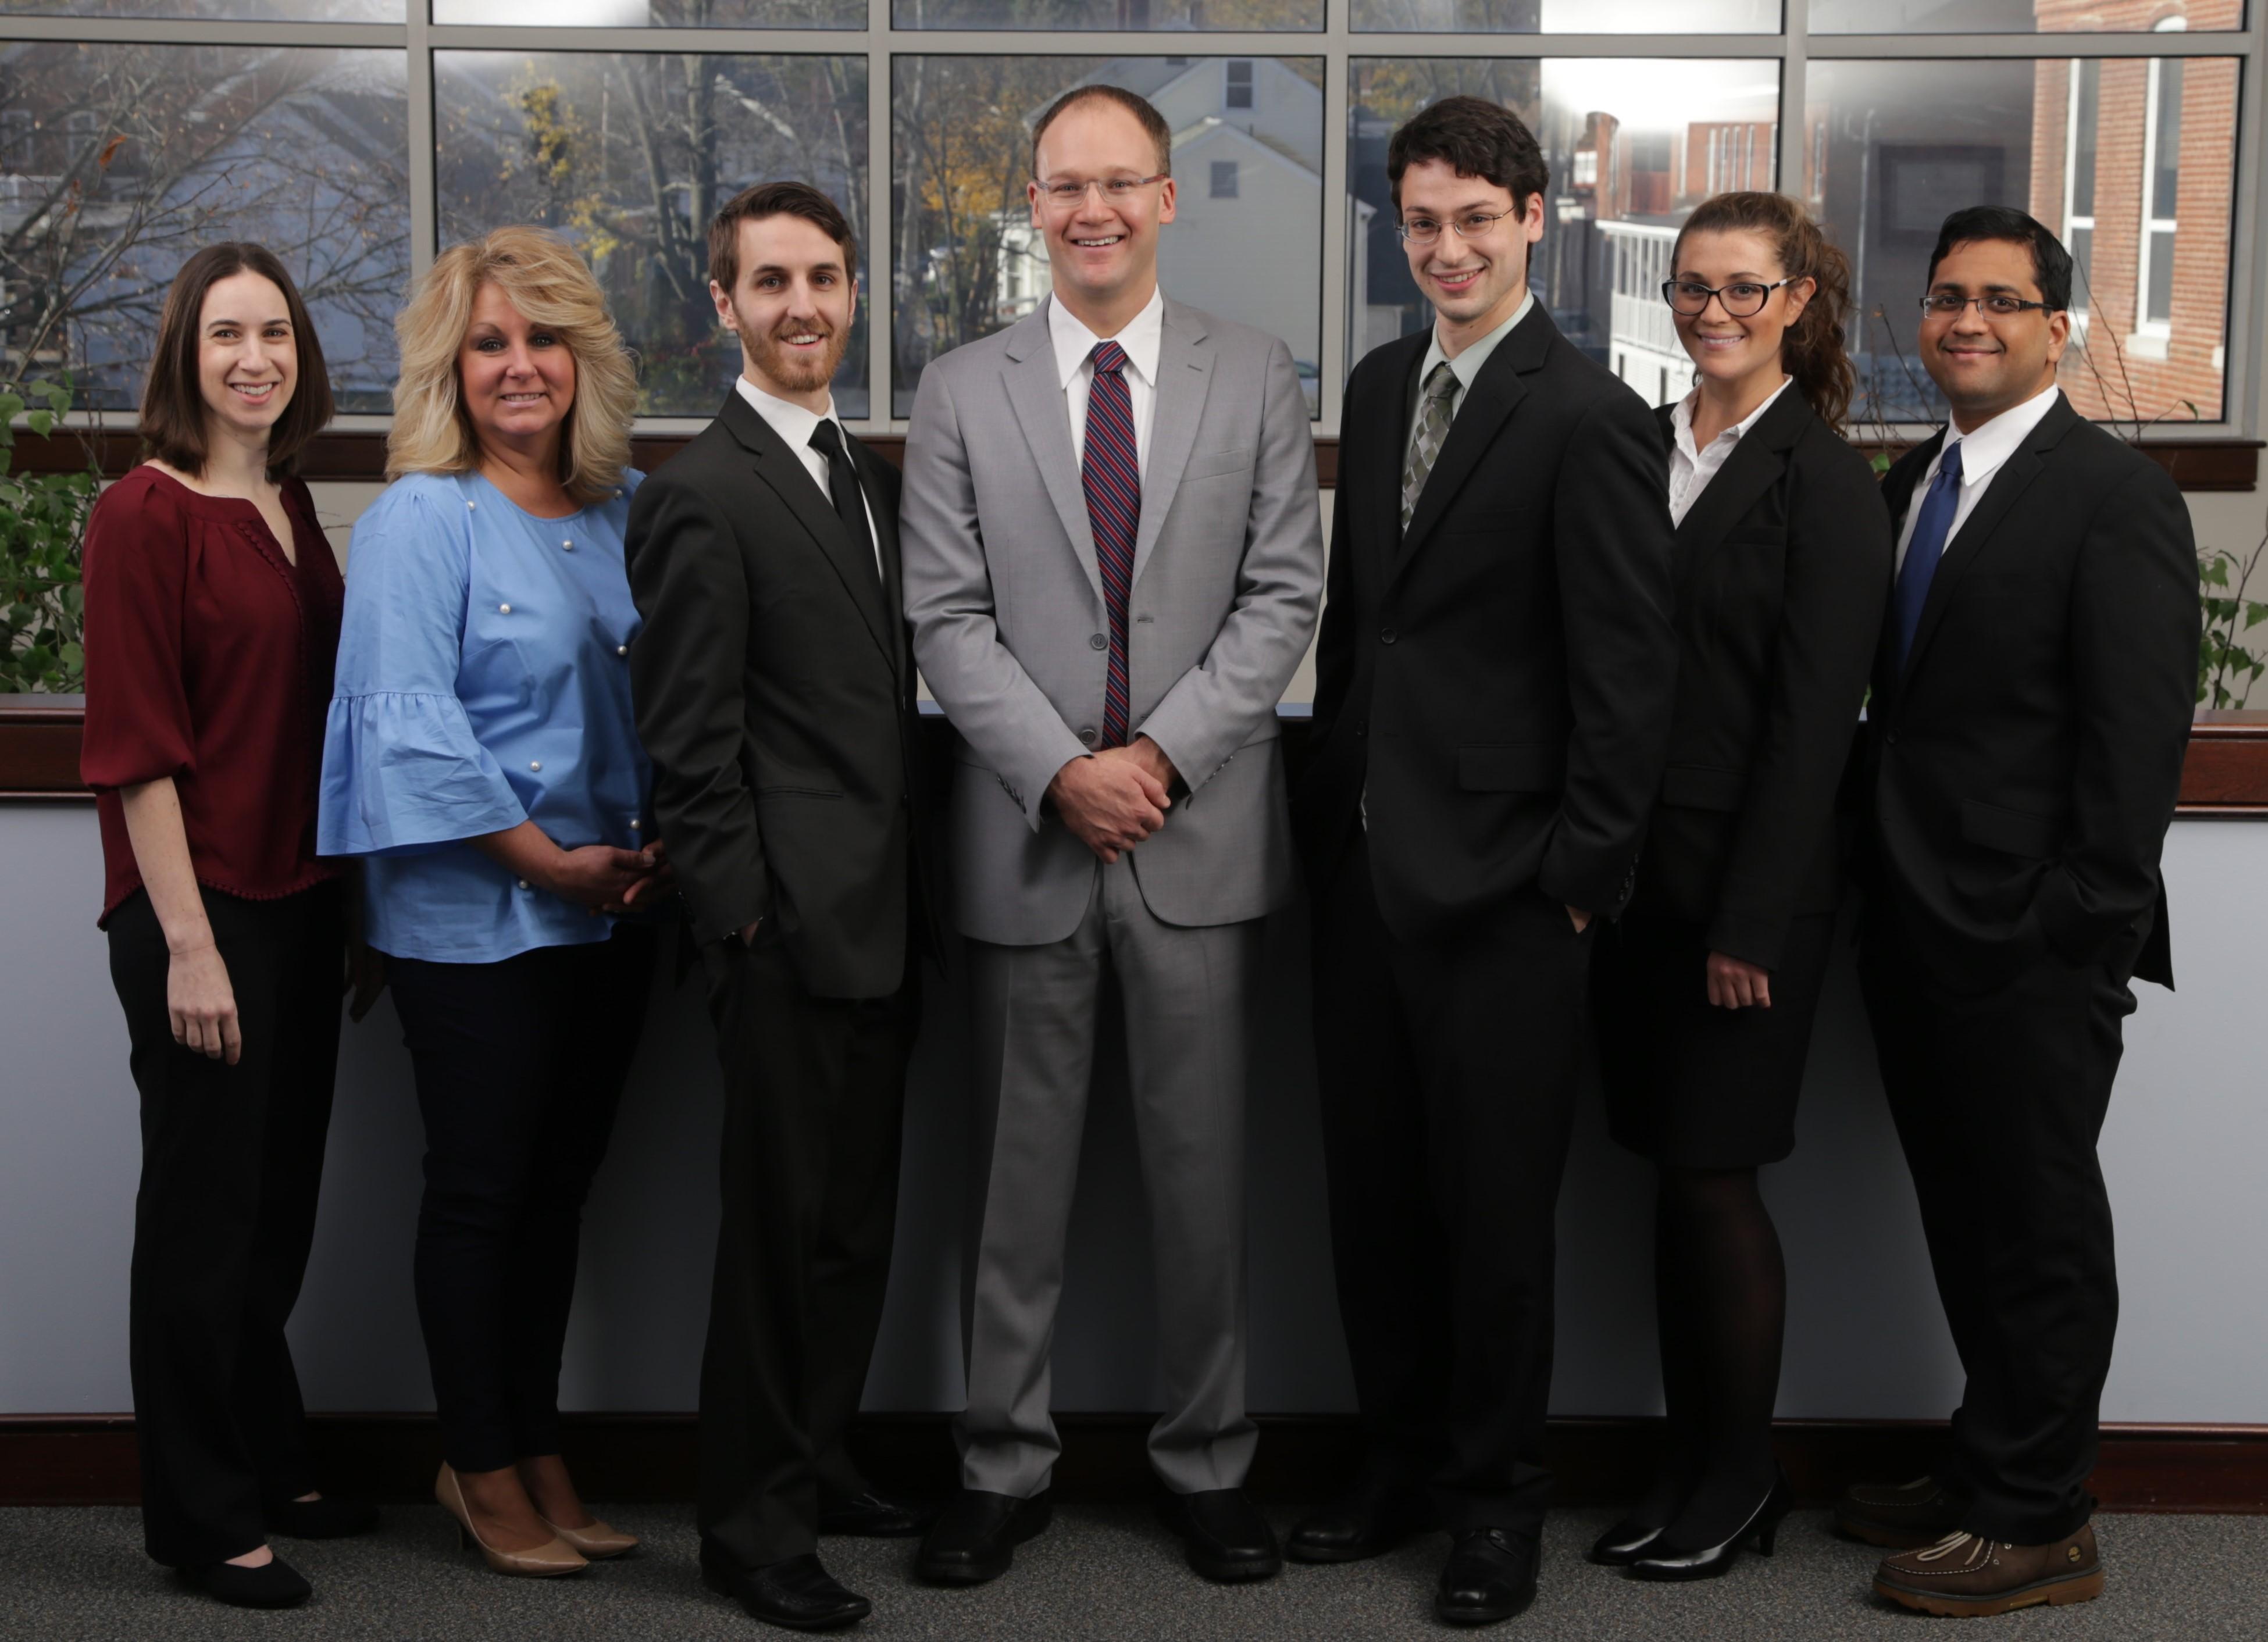 The Law Offices of Wyatt & Associates